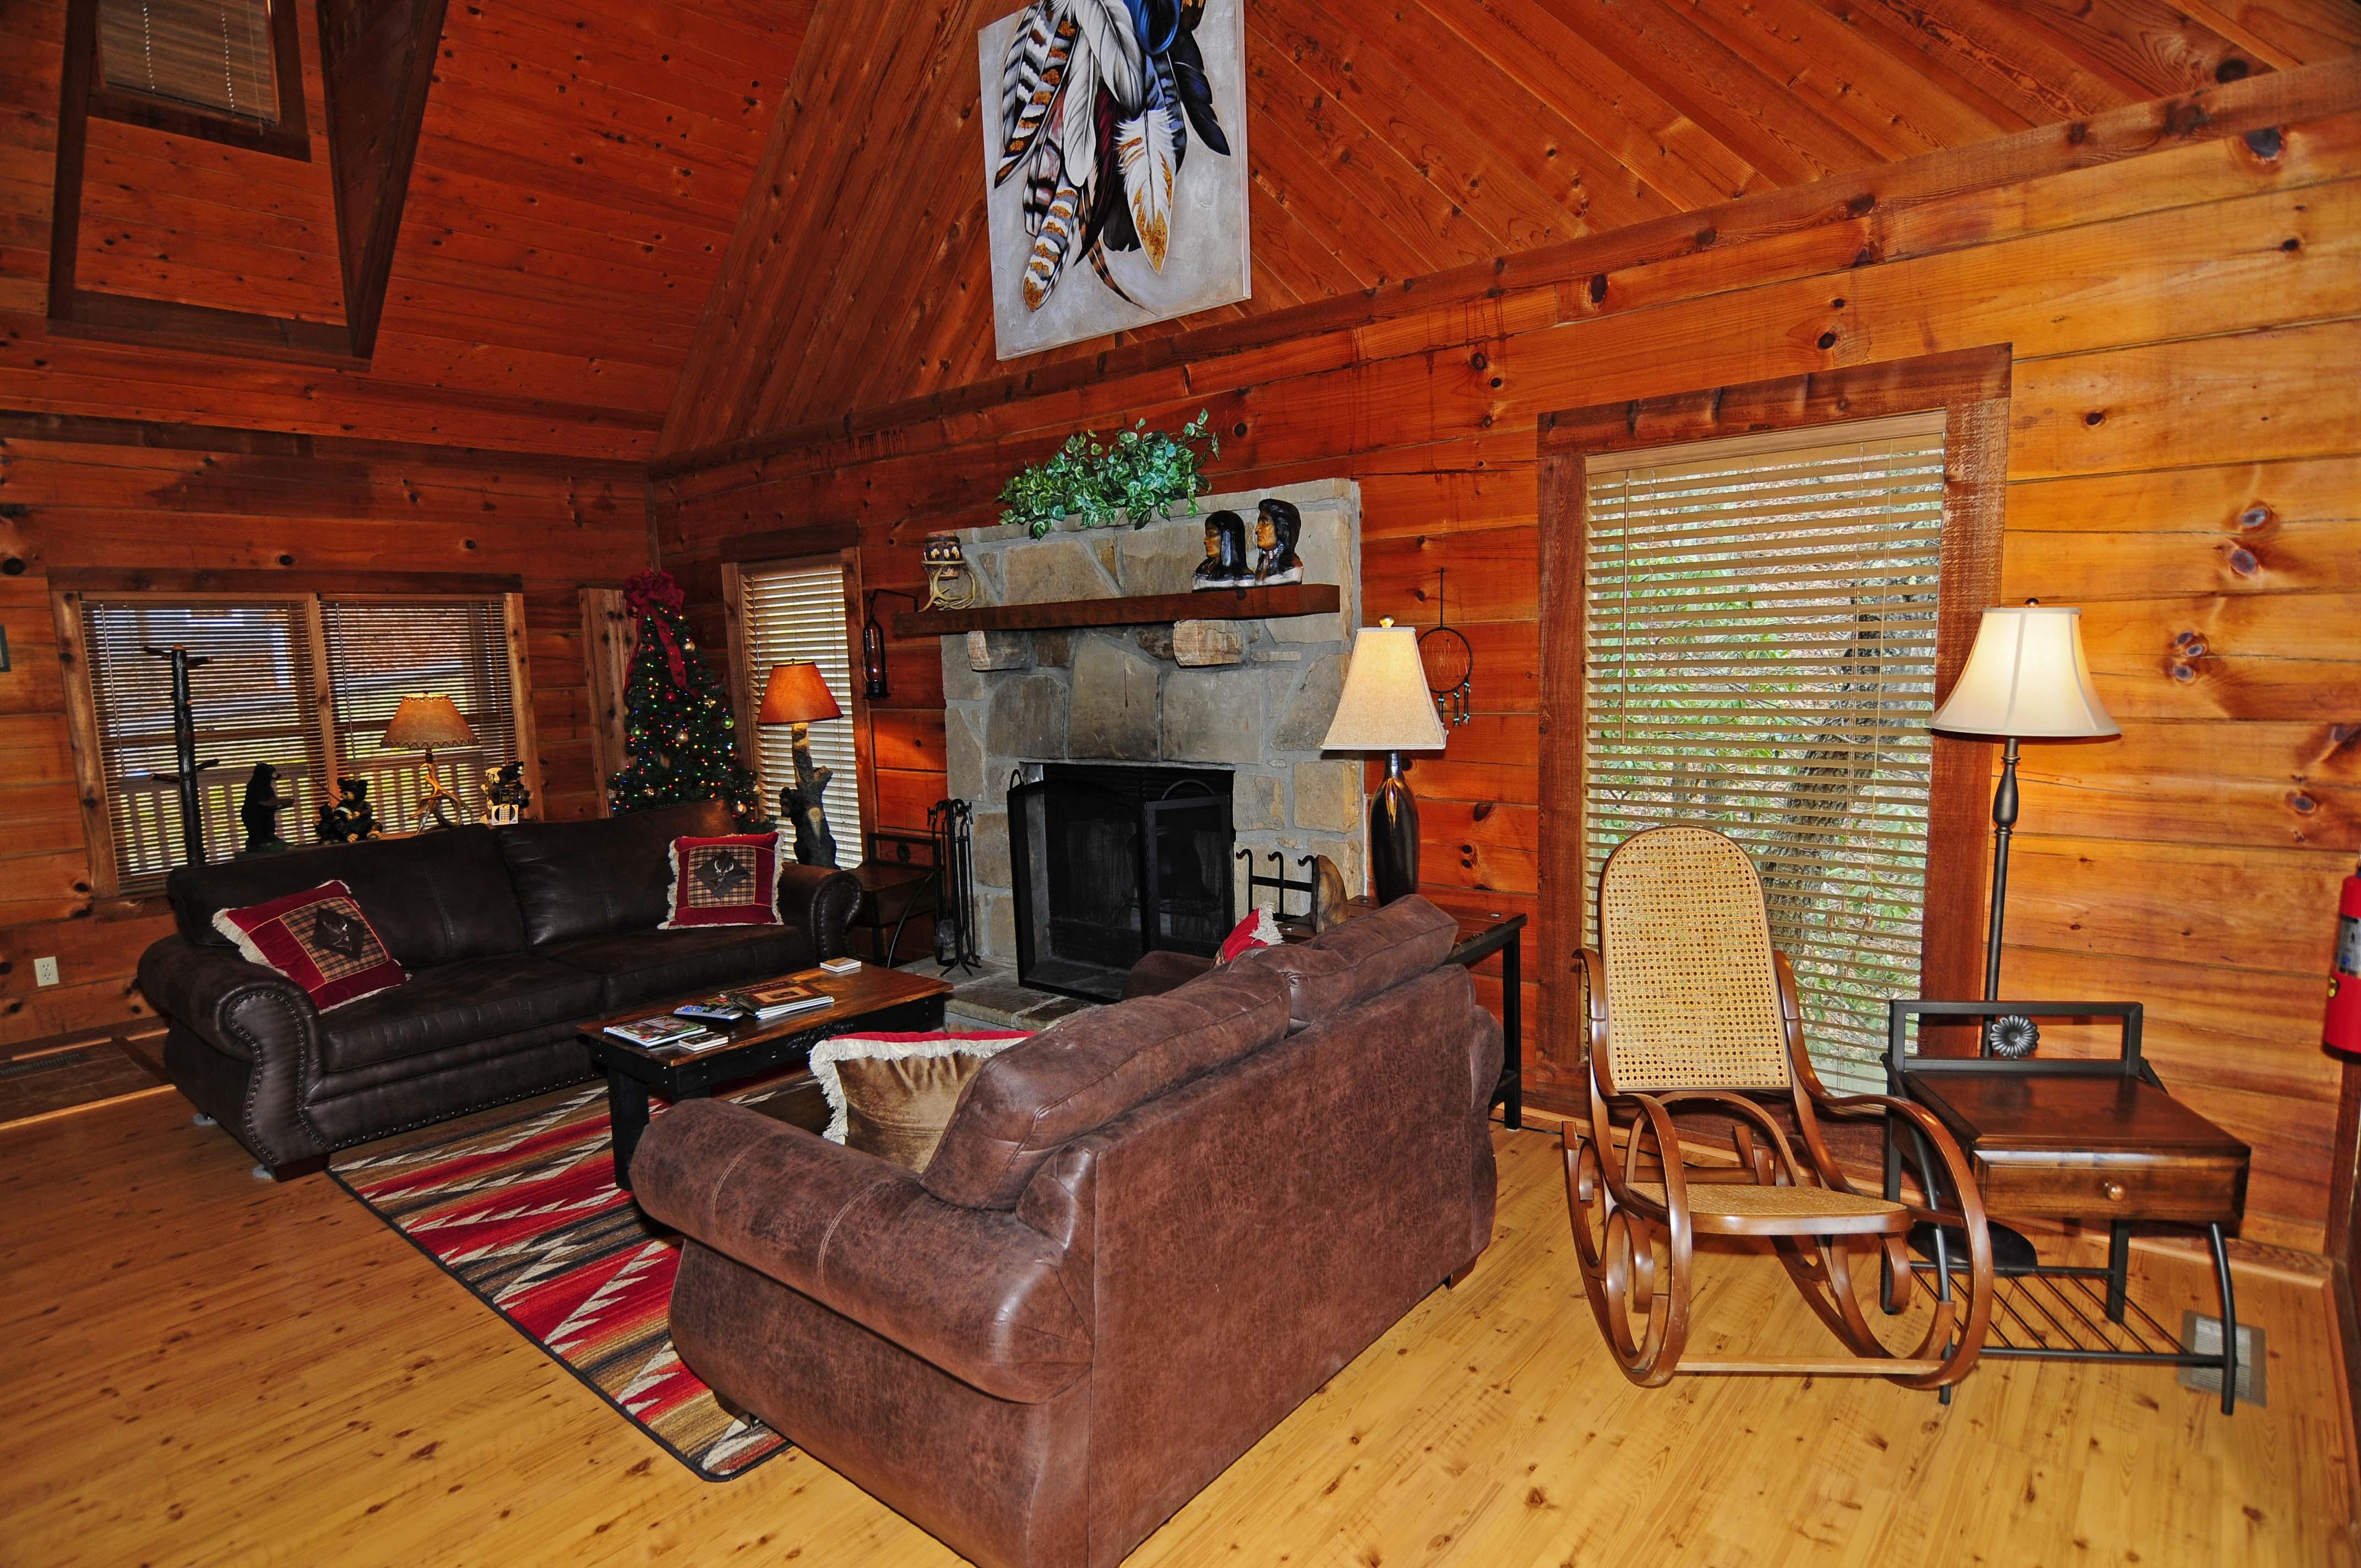 nights cherokee sevierville online pigeon gatlinburg rental bedroom cabins forge cabin